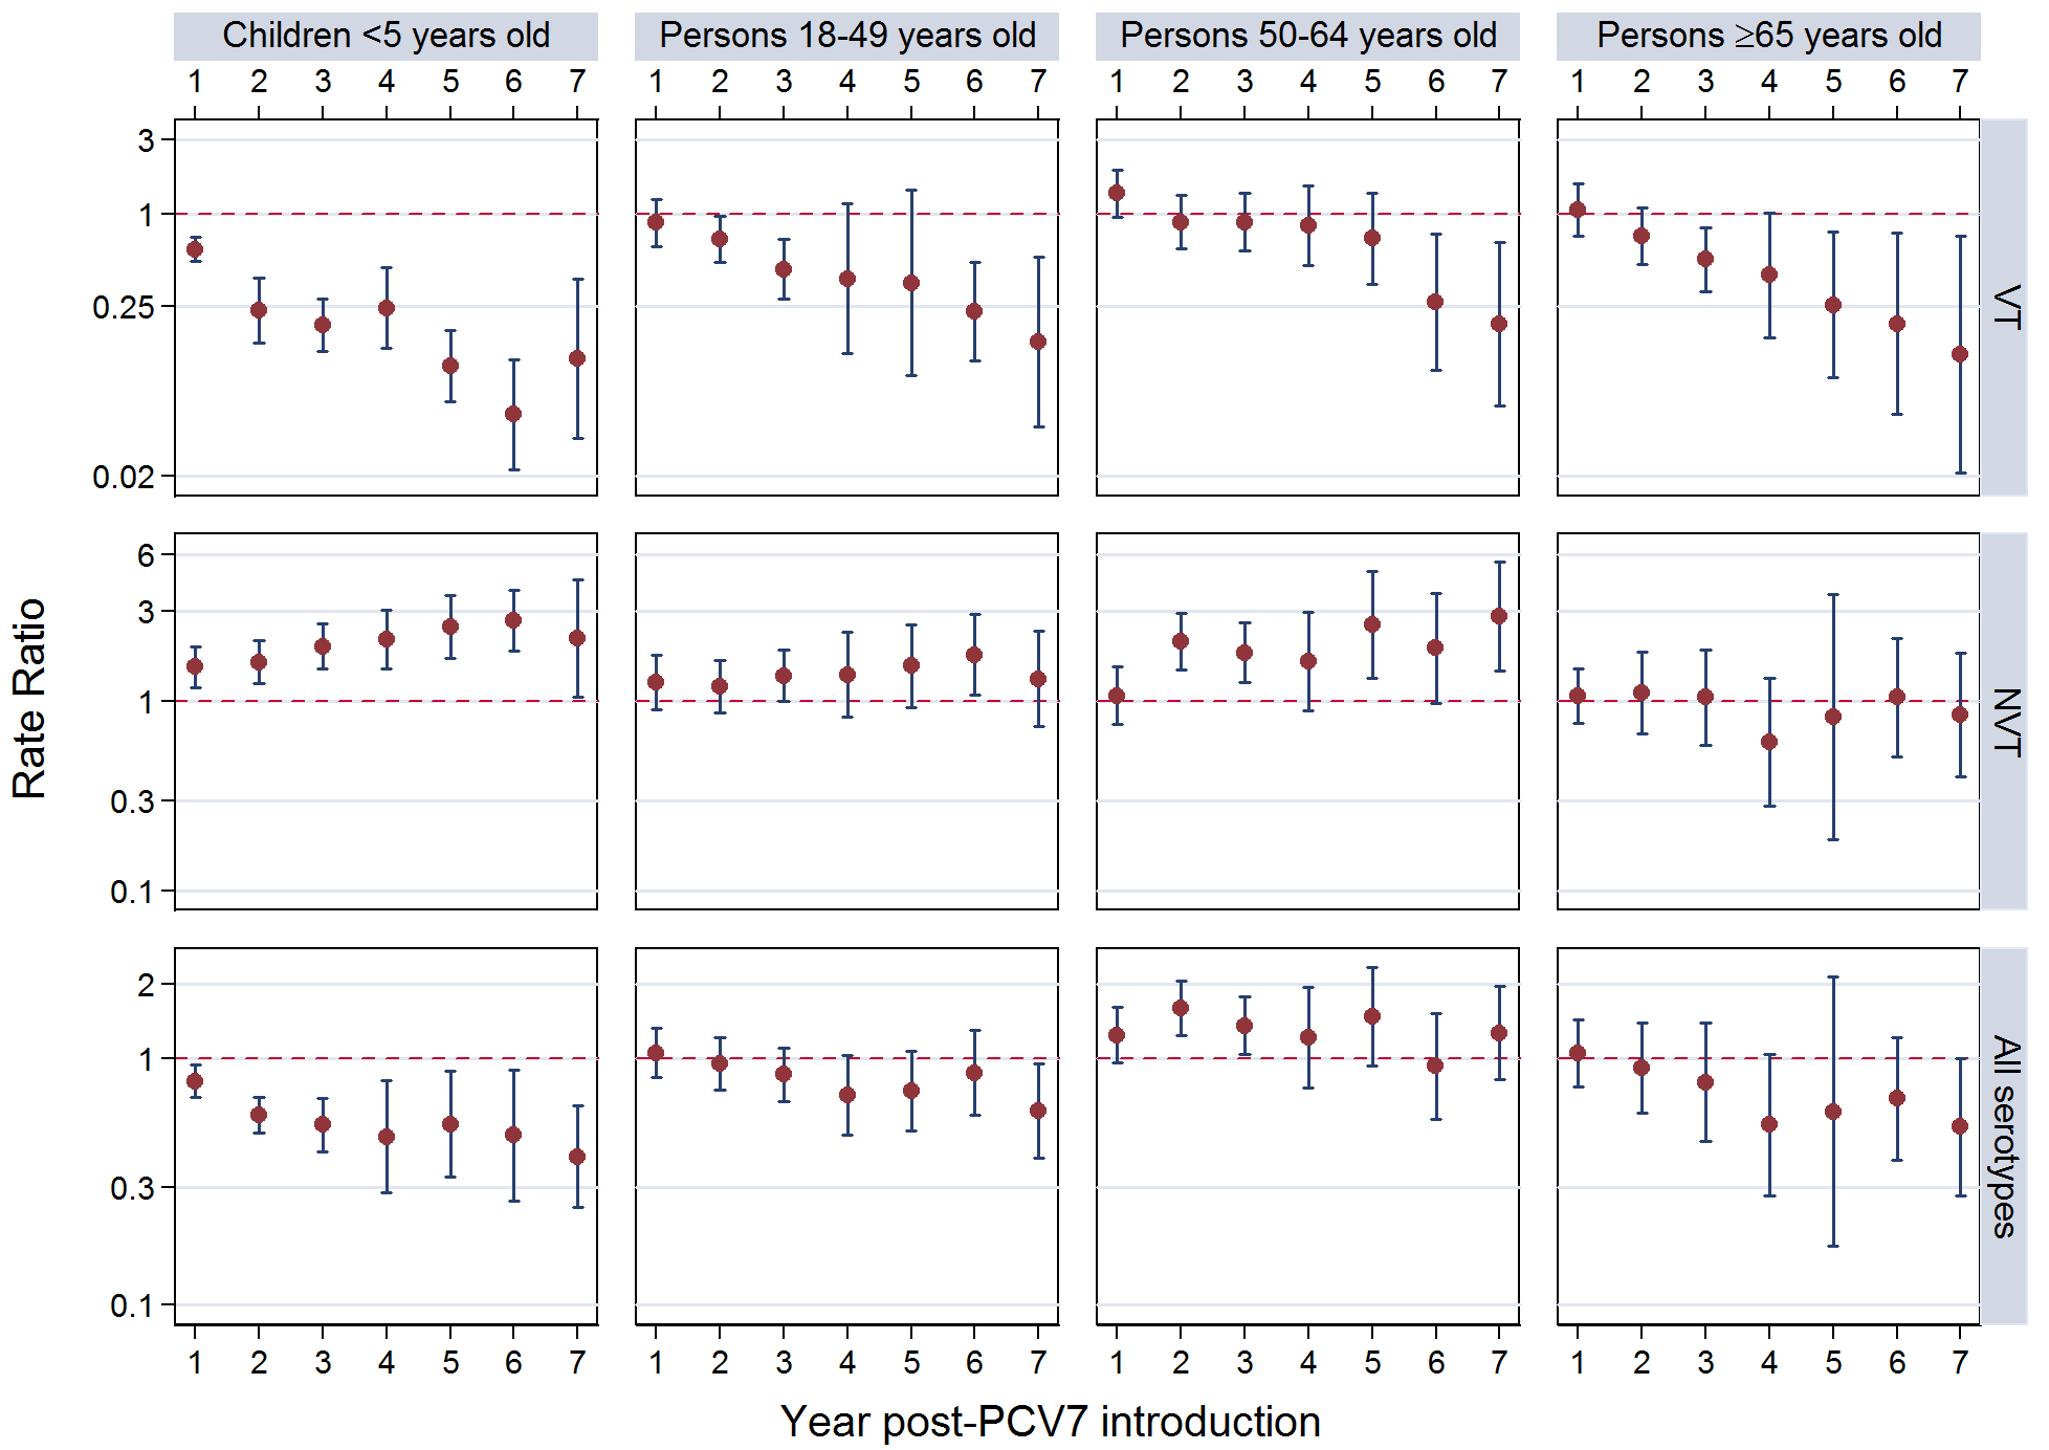 Post-PCV7 introduction pneumococcal meningitis summary rate ratios.